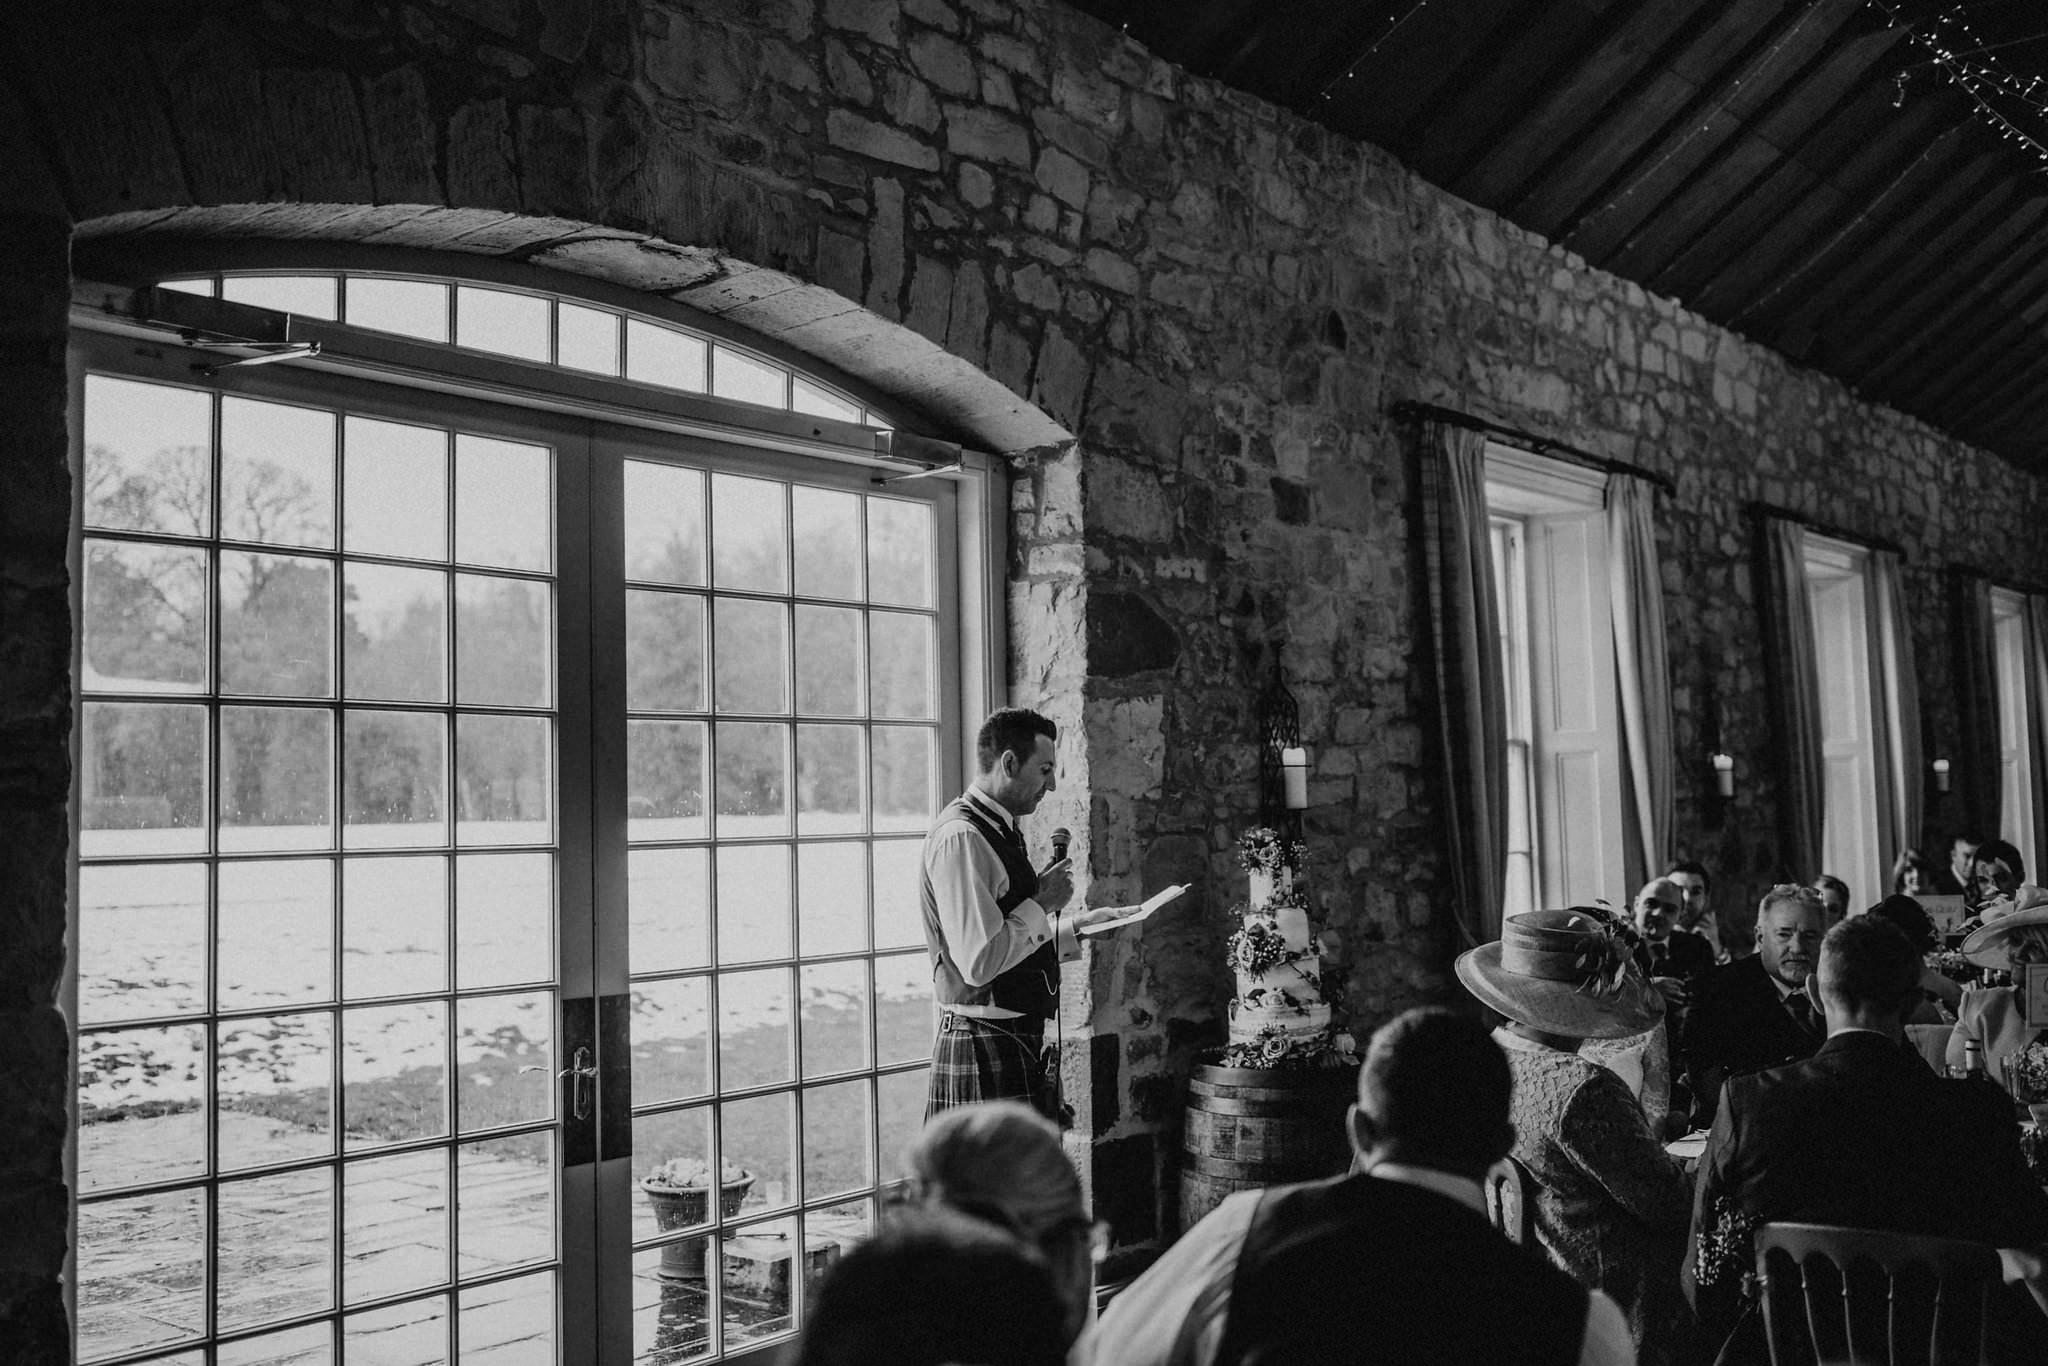 kirknewton stables wedding photographer (62).jpg